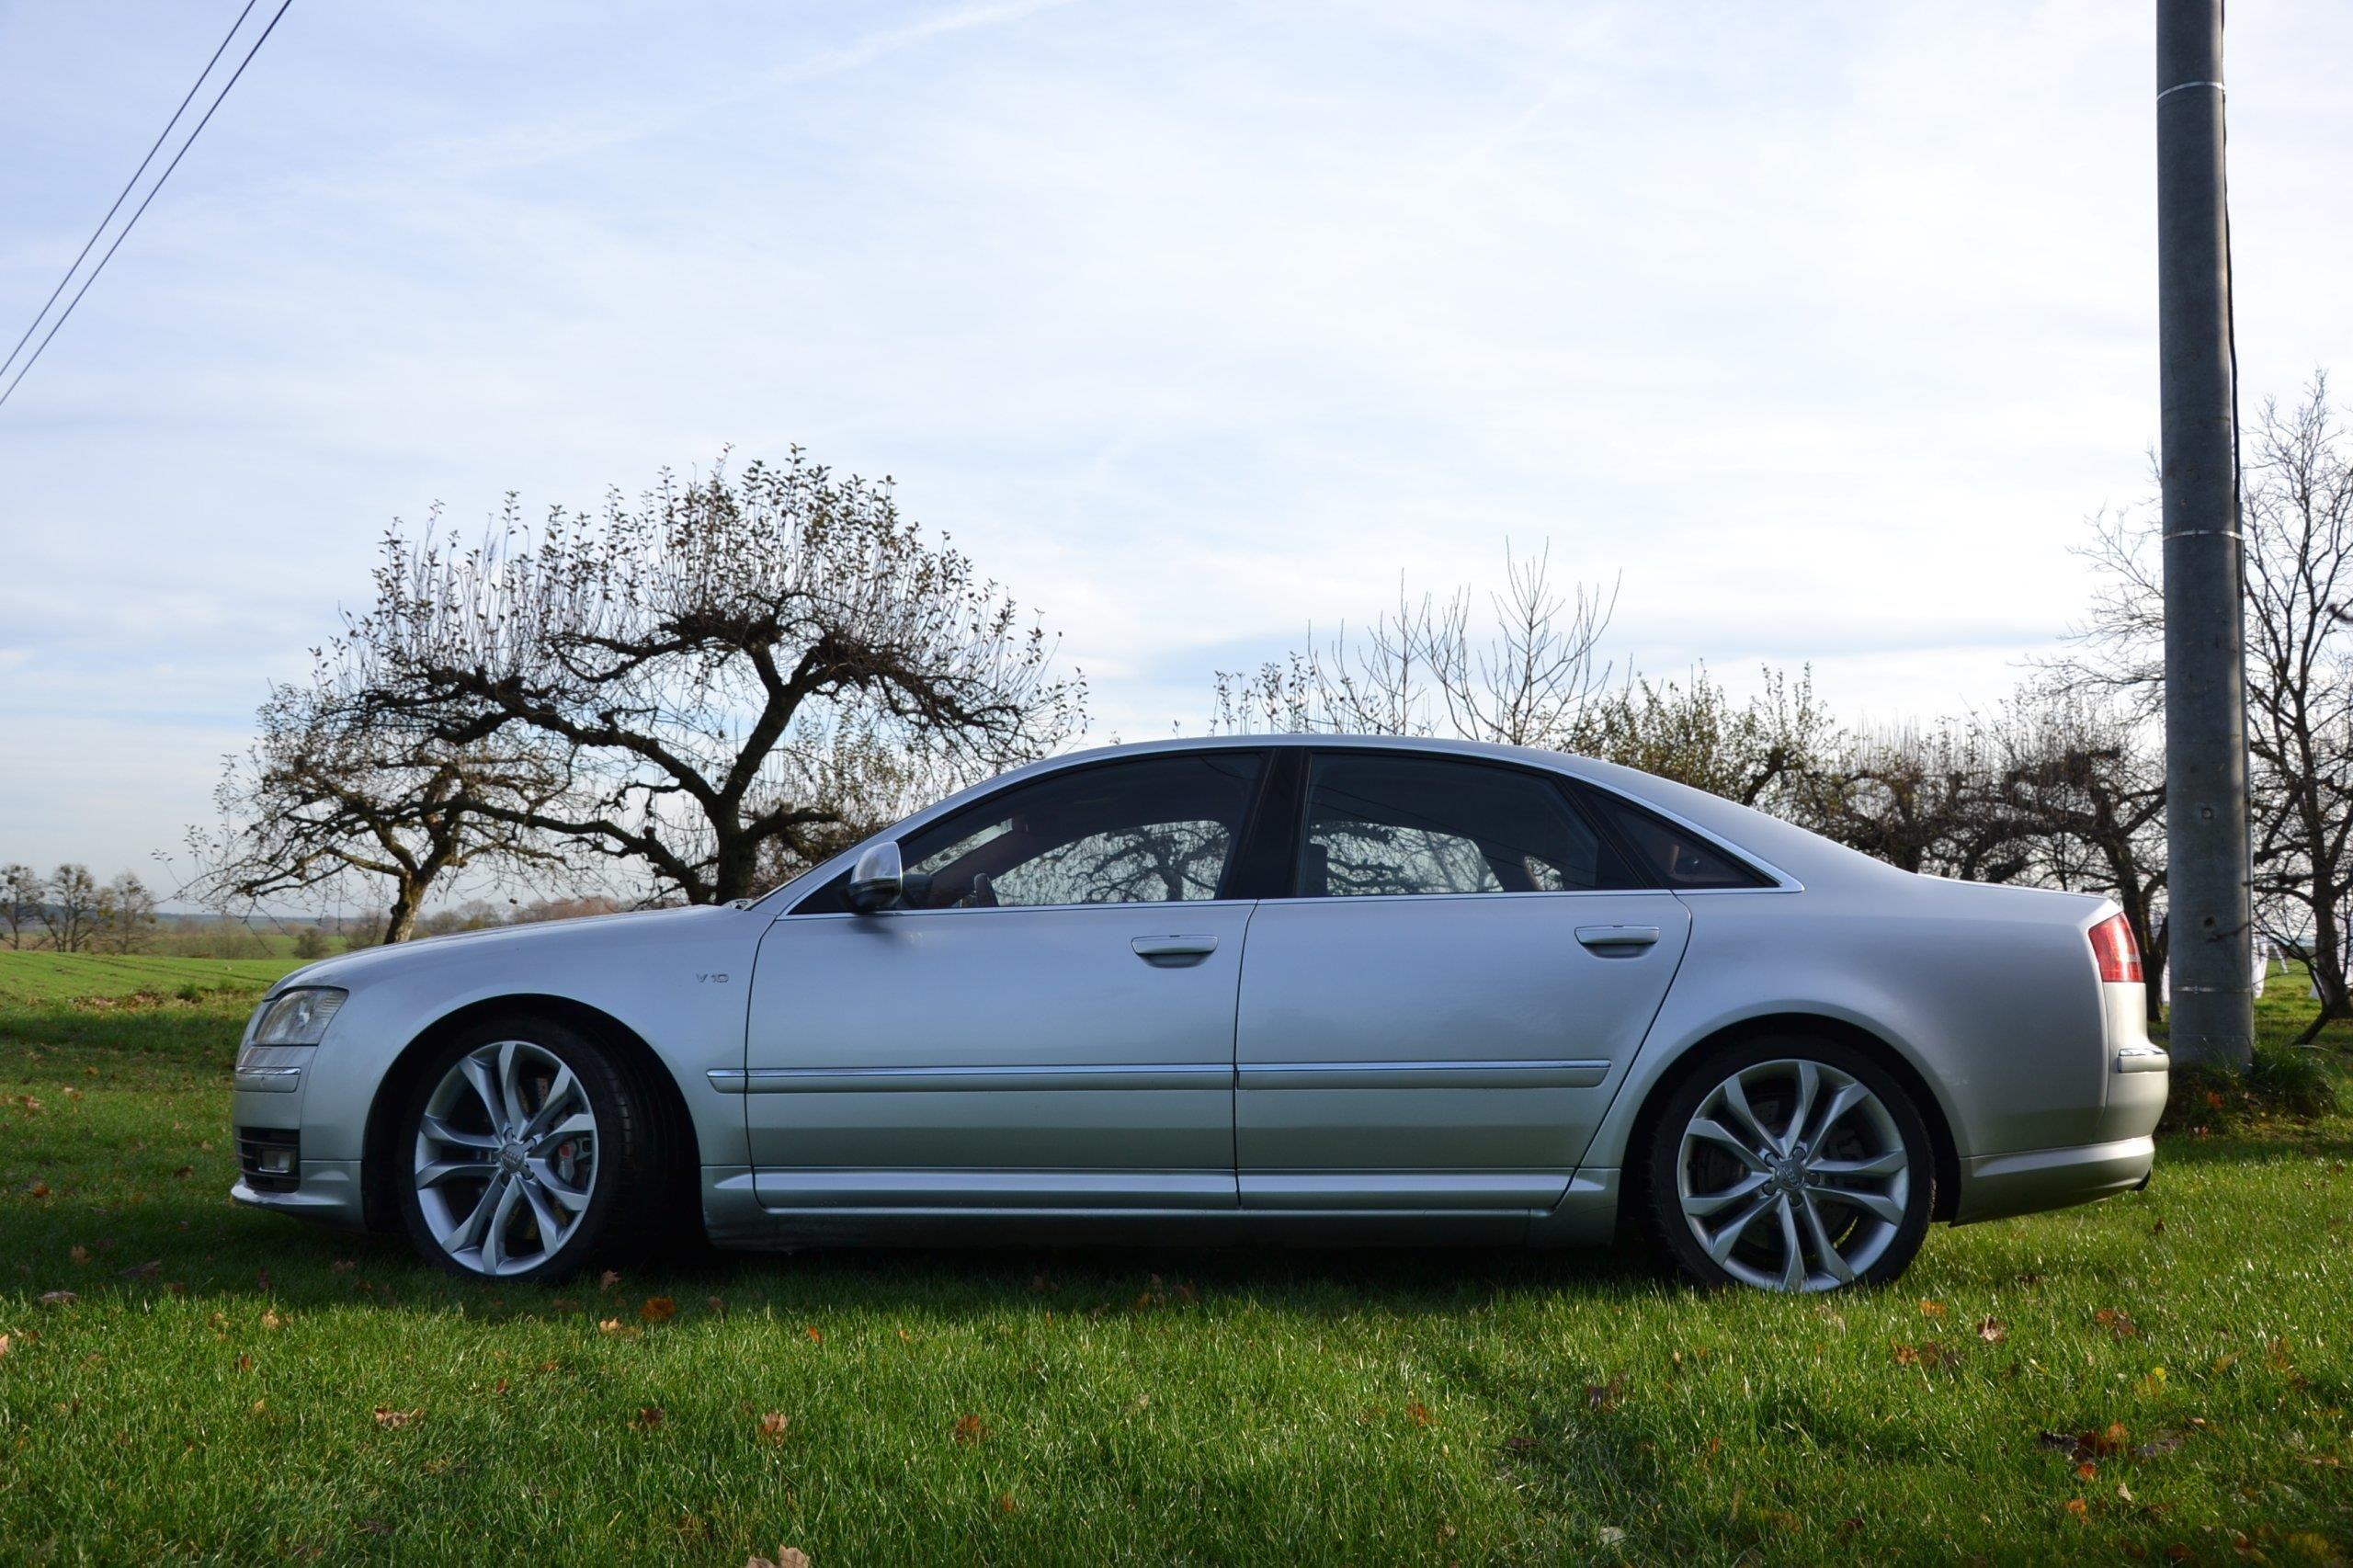 Audi S8 D3 2008 benzyna 450KM srebrny - Opinie i ceny na ...